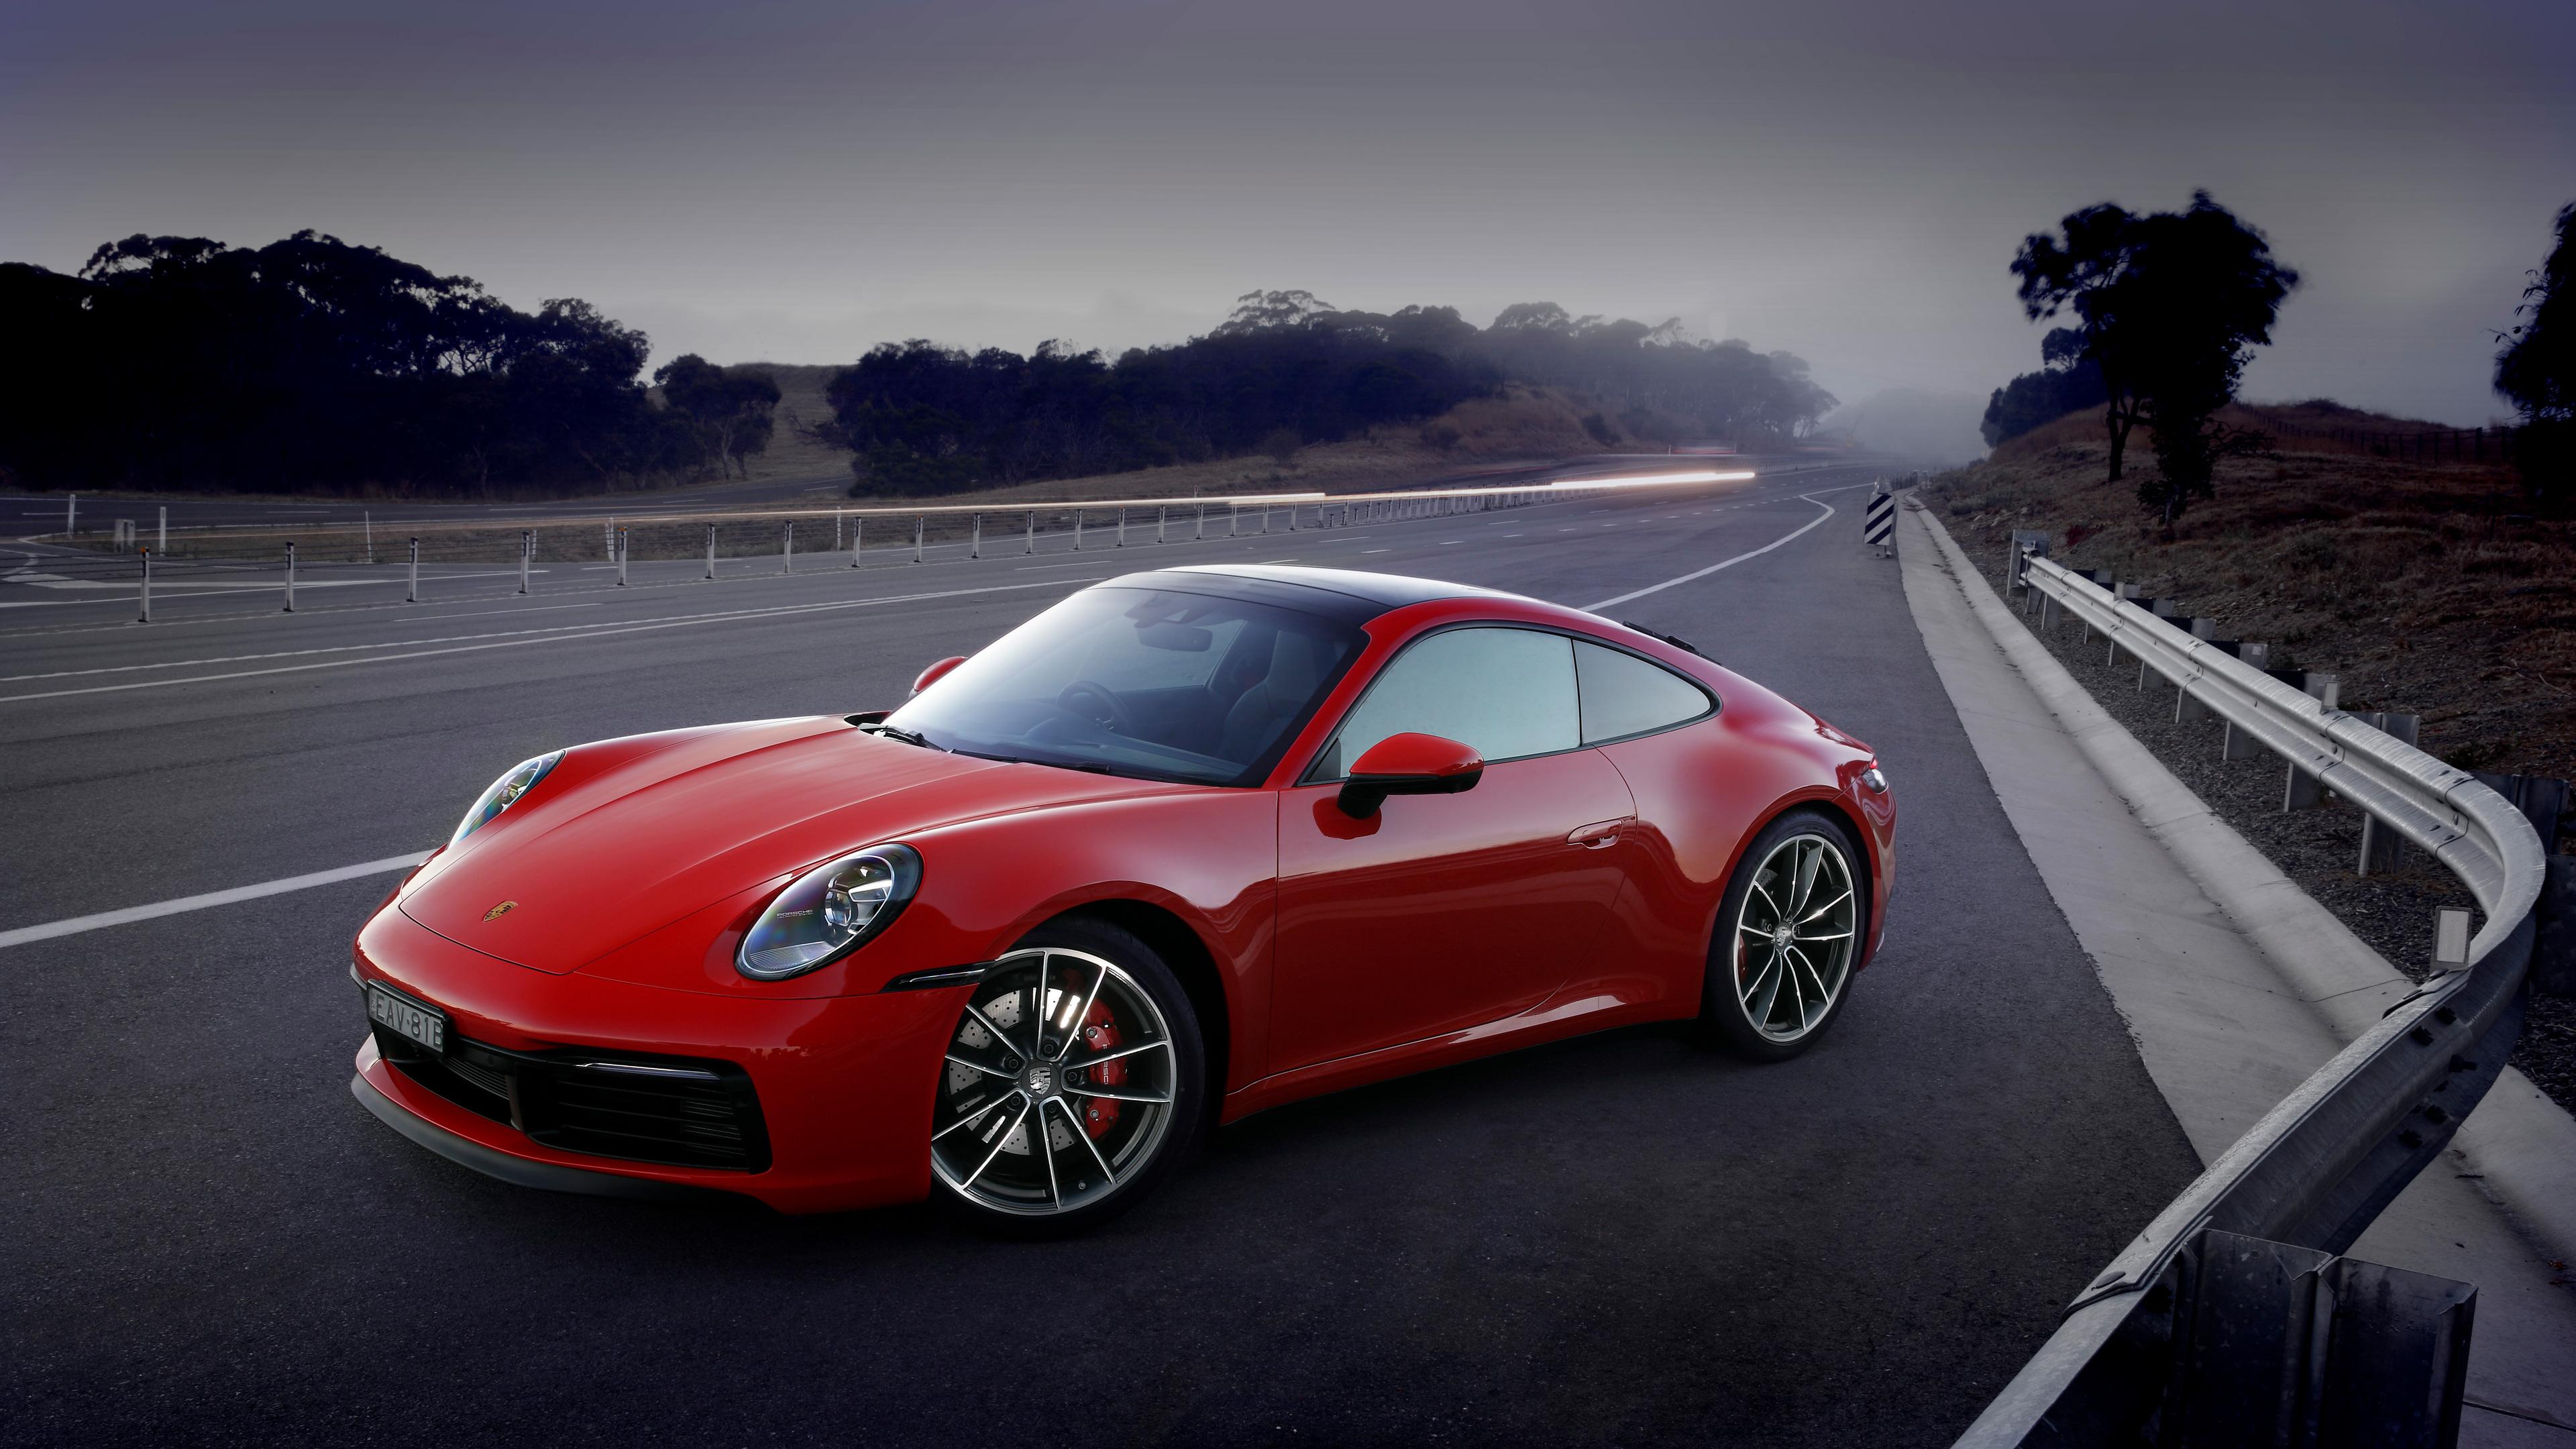 porsche 911 carrera s1 2019 4k 1554245292 - Porsche 911 Carrera S1 2019 4k - porsche wallpapers, porsche 911 wallpapers, hd-wallpapers, cars wallpapers, 5k wallpapers, 4k-wallpapers, 2019 cars wallpapers